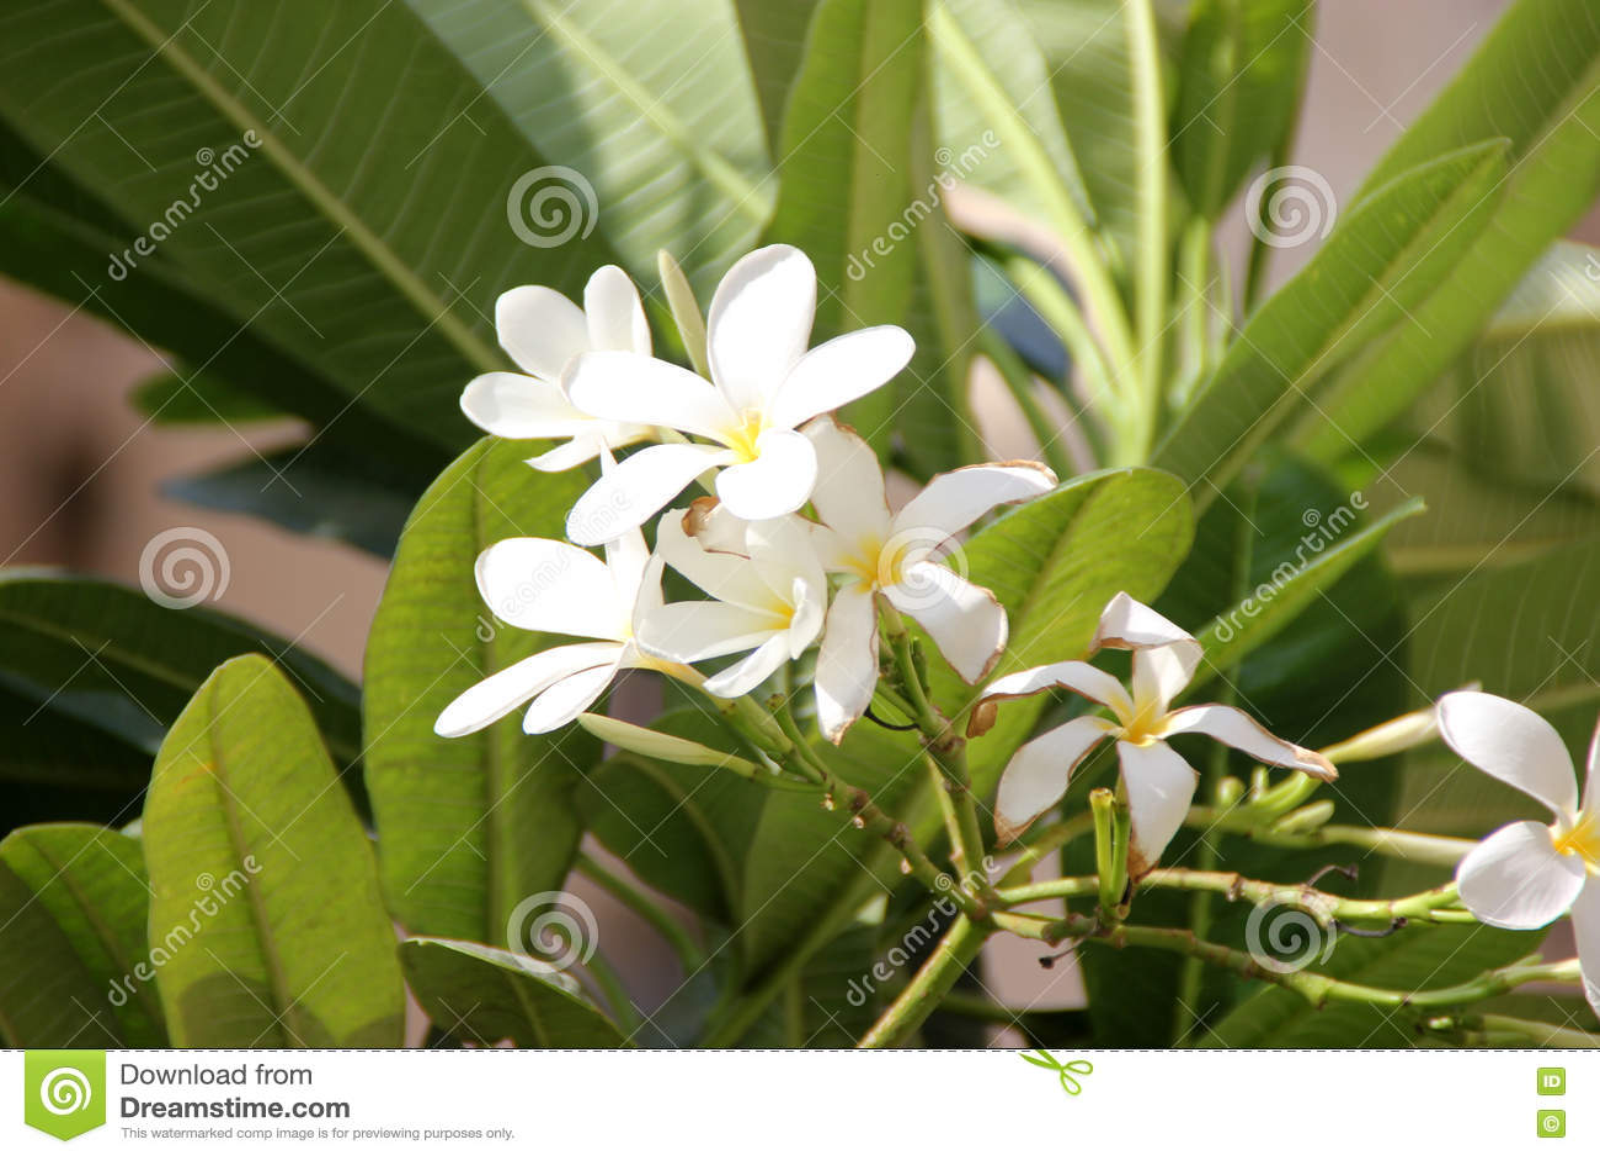 Plumeria Obtusa Singapore Graveyard Flower Stock Image Image Of